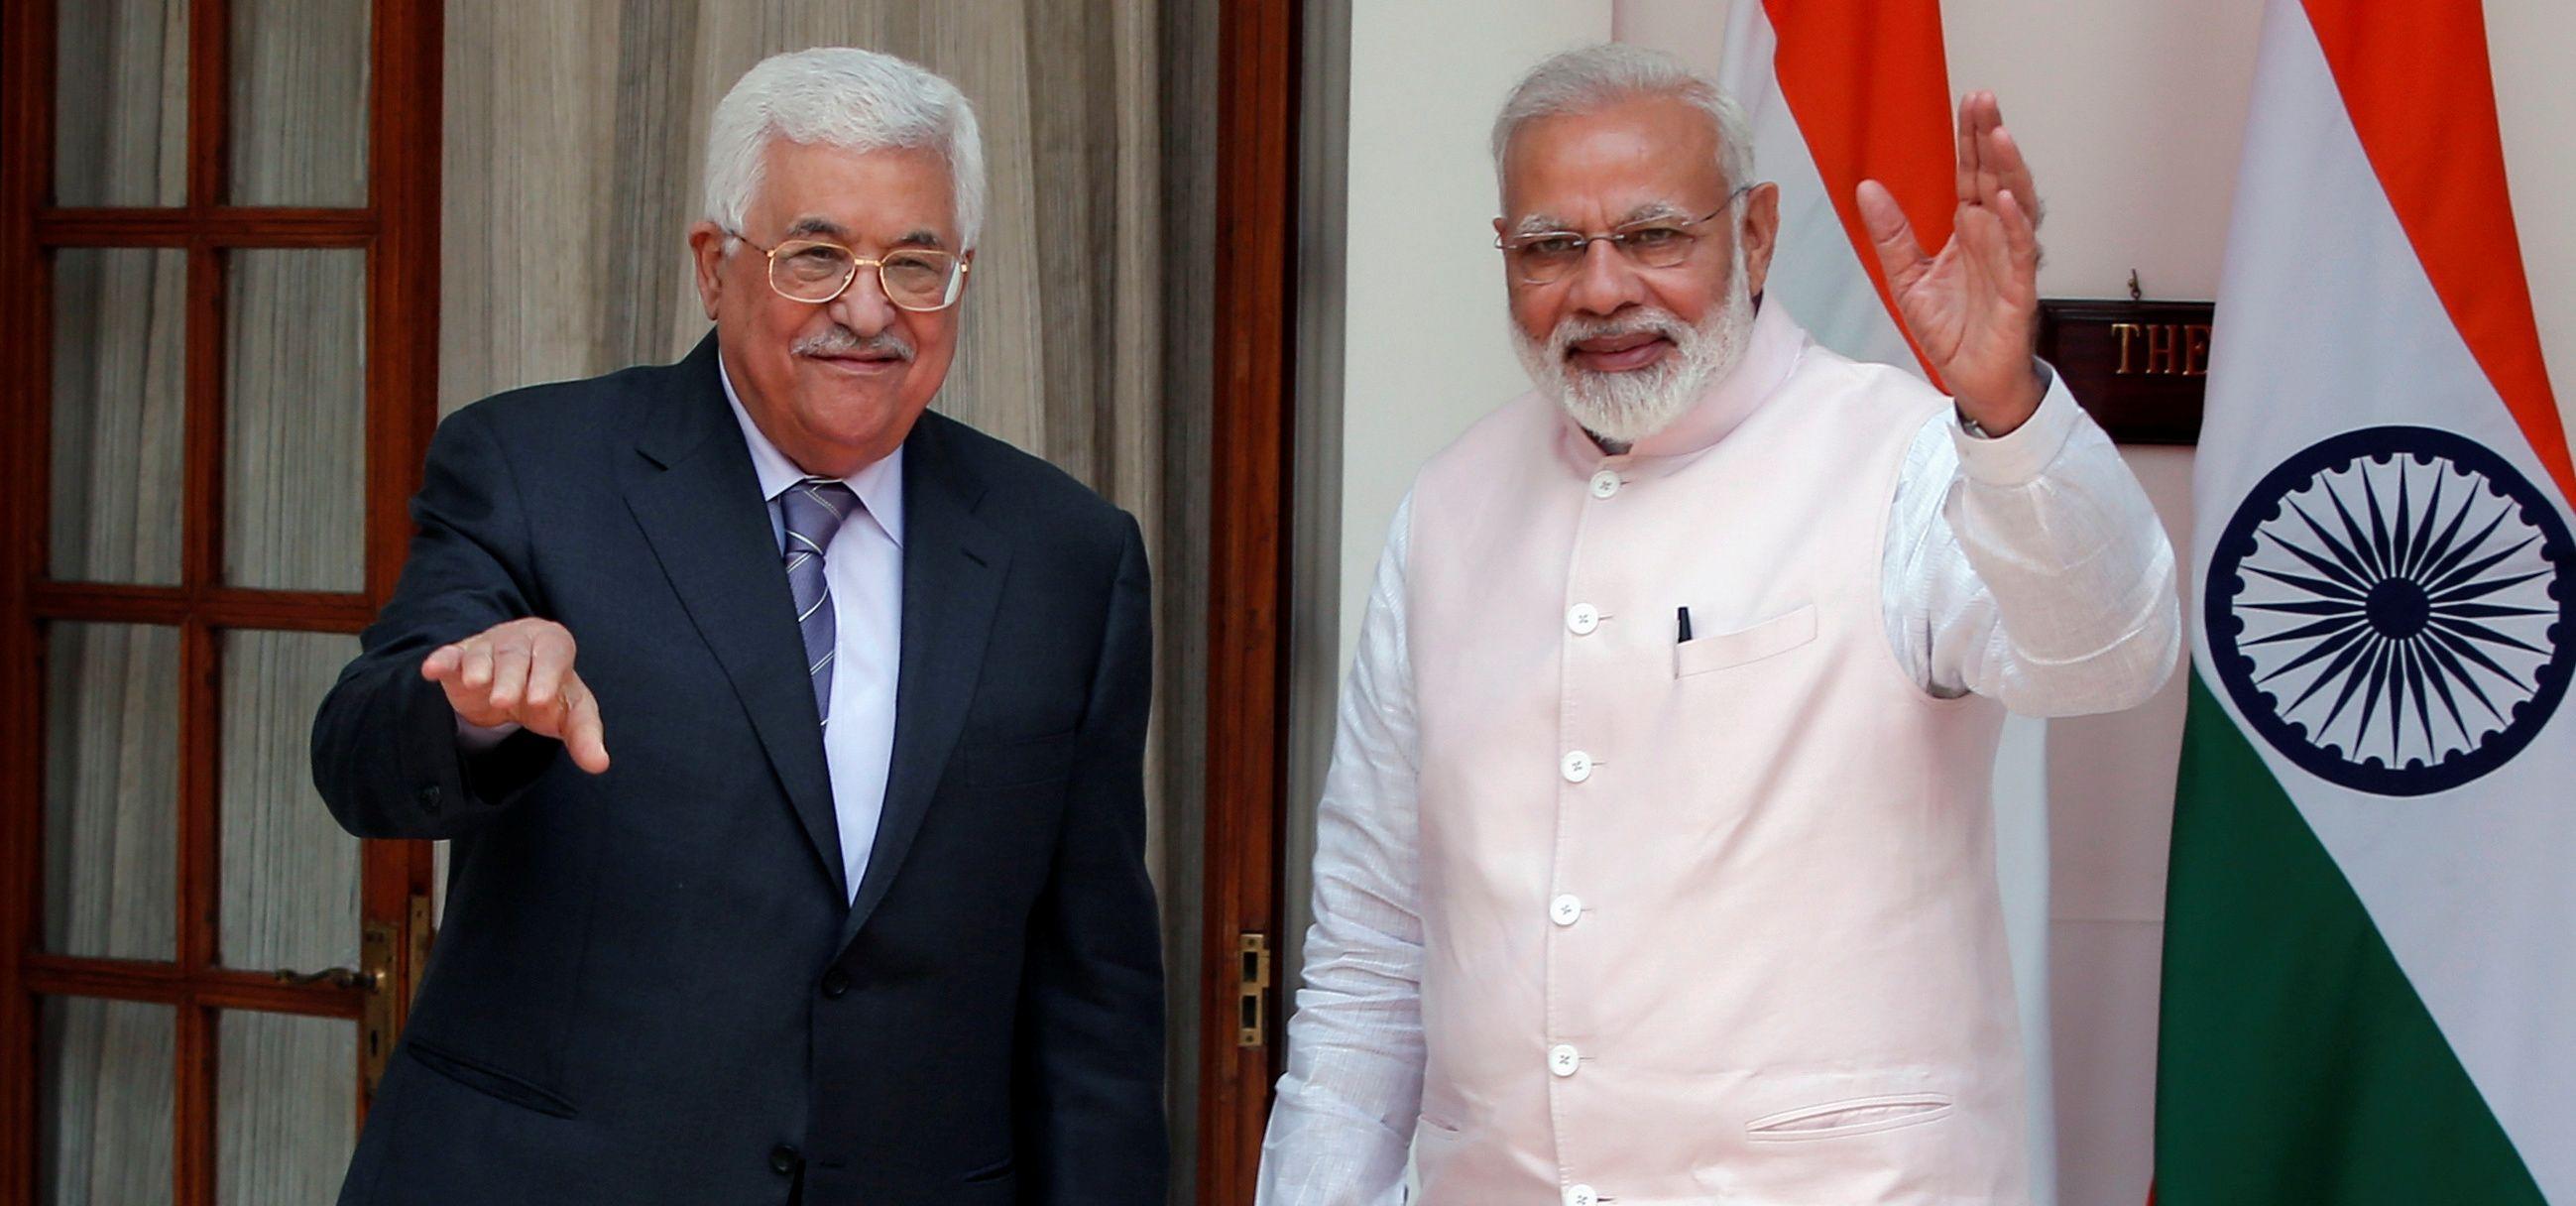 Modi and palestine